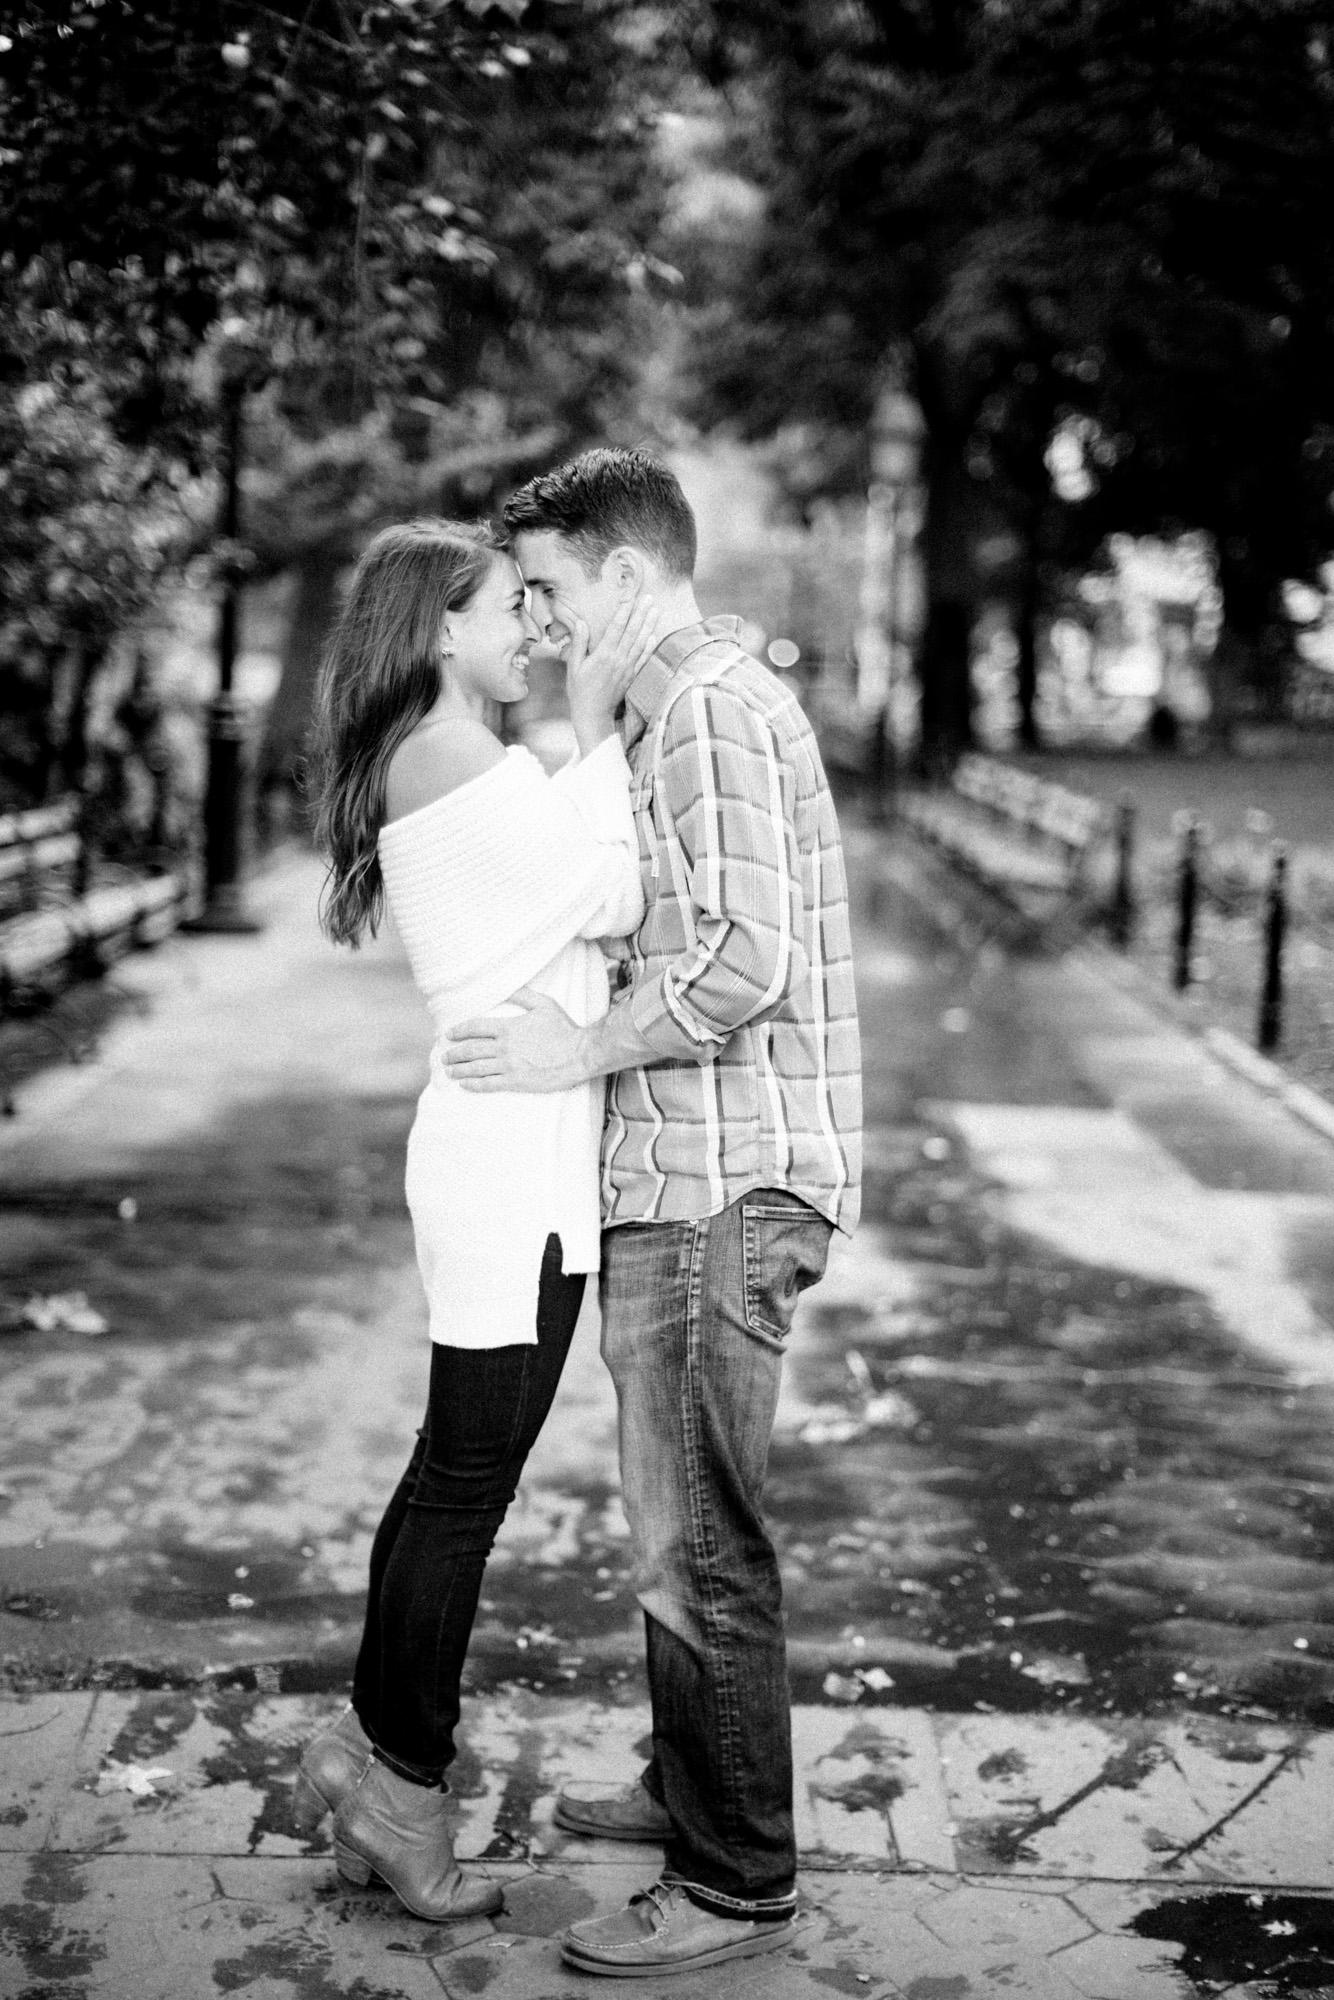 new-york-city-wedding-photography-hunter-ryan-photo-05164.jpg